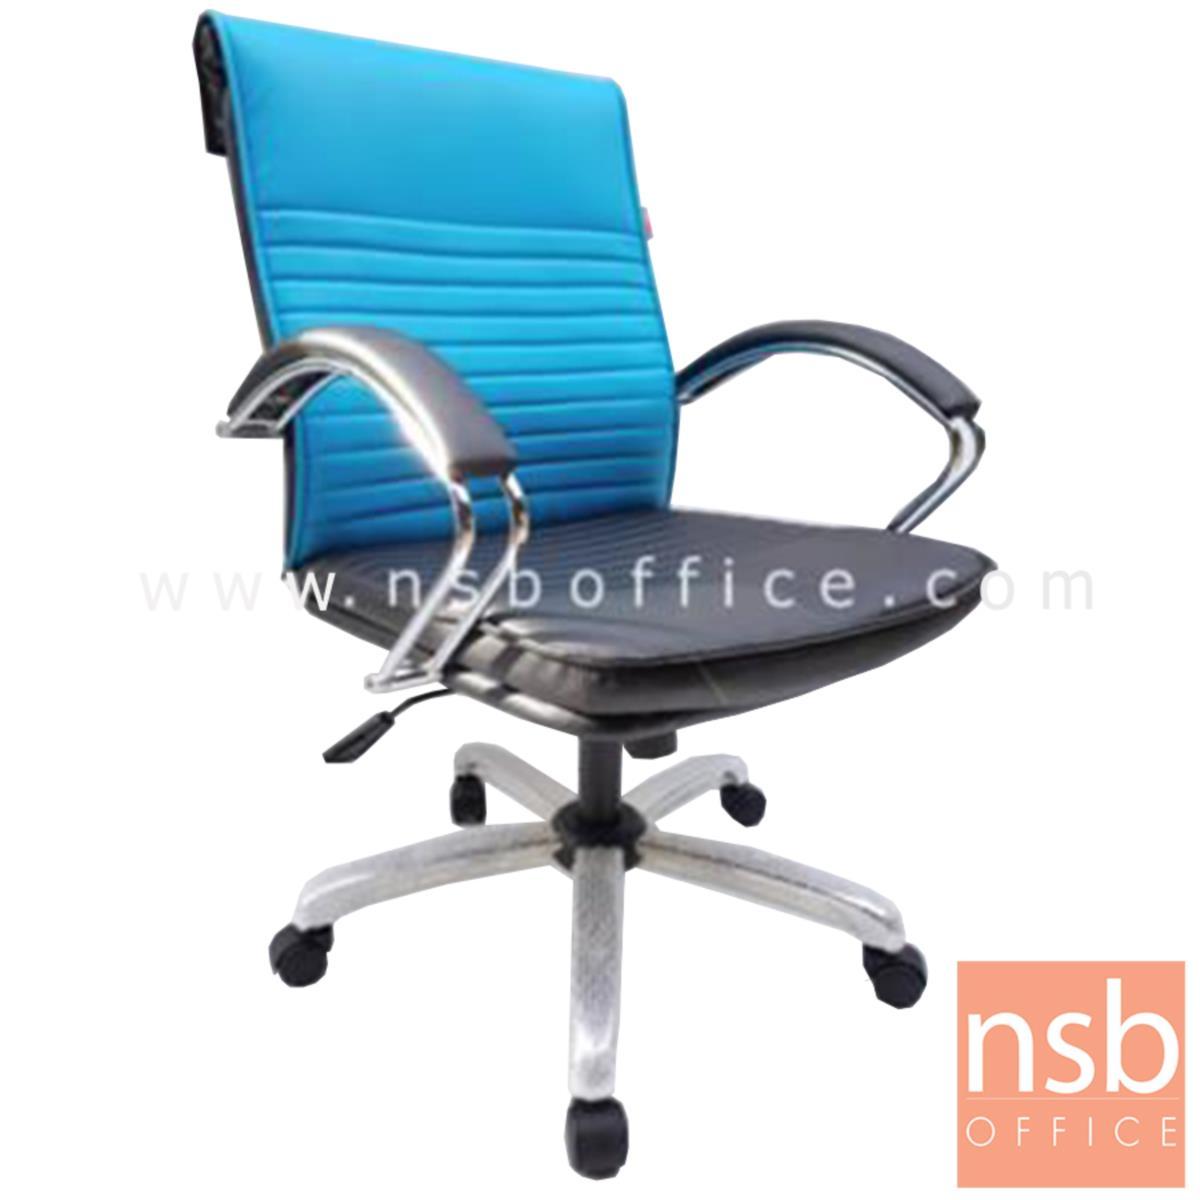 B03A234:เก้าอี้สำนักงาน รุ่น  KS-110M  โช๊คแก๊ส มีก้อนโยก ขาเหล็กชุบโครเมี่ยม